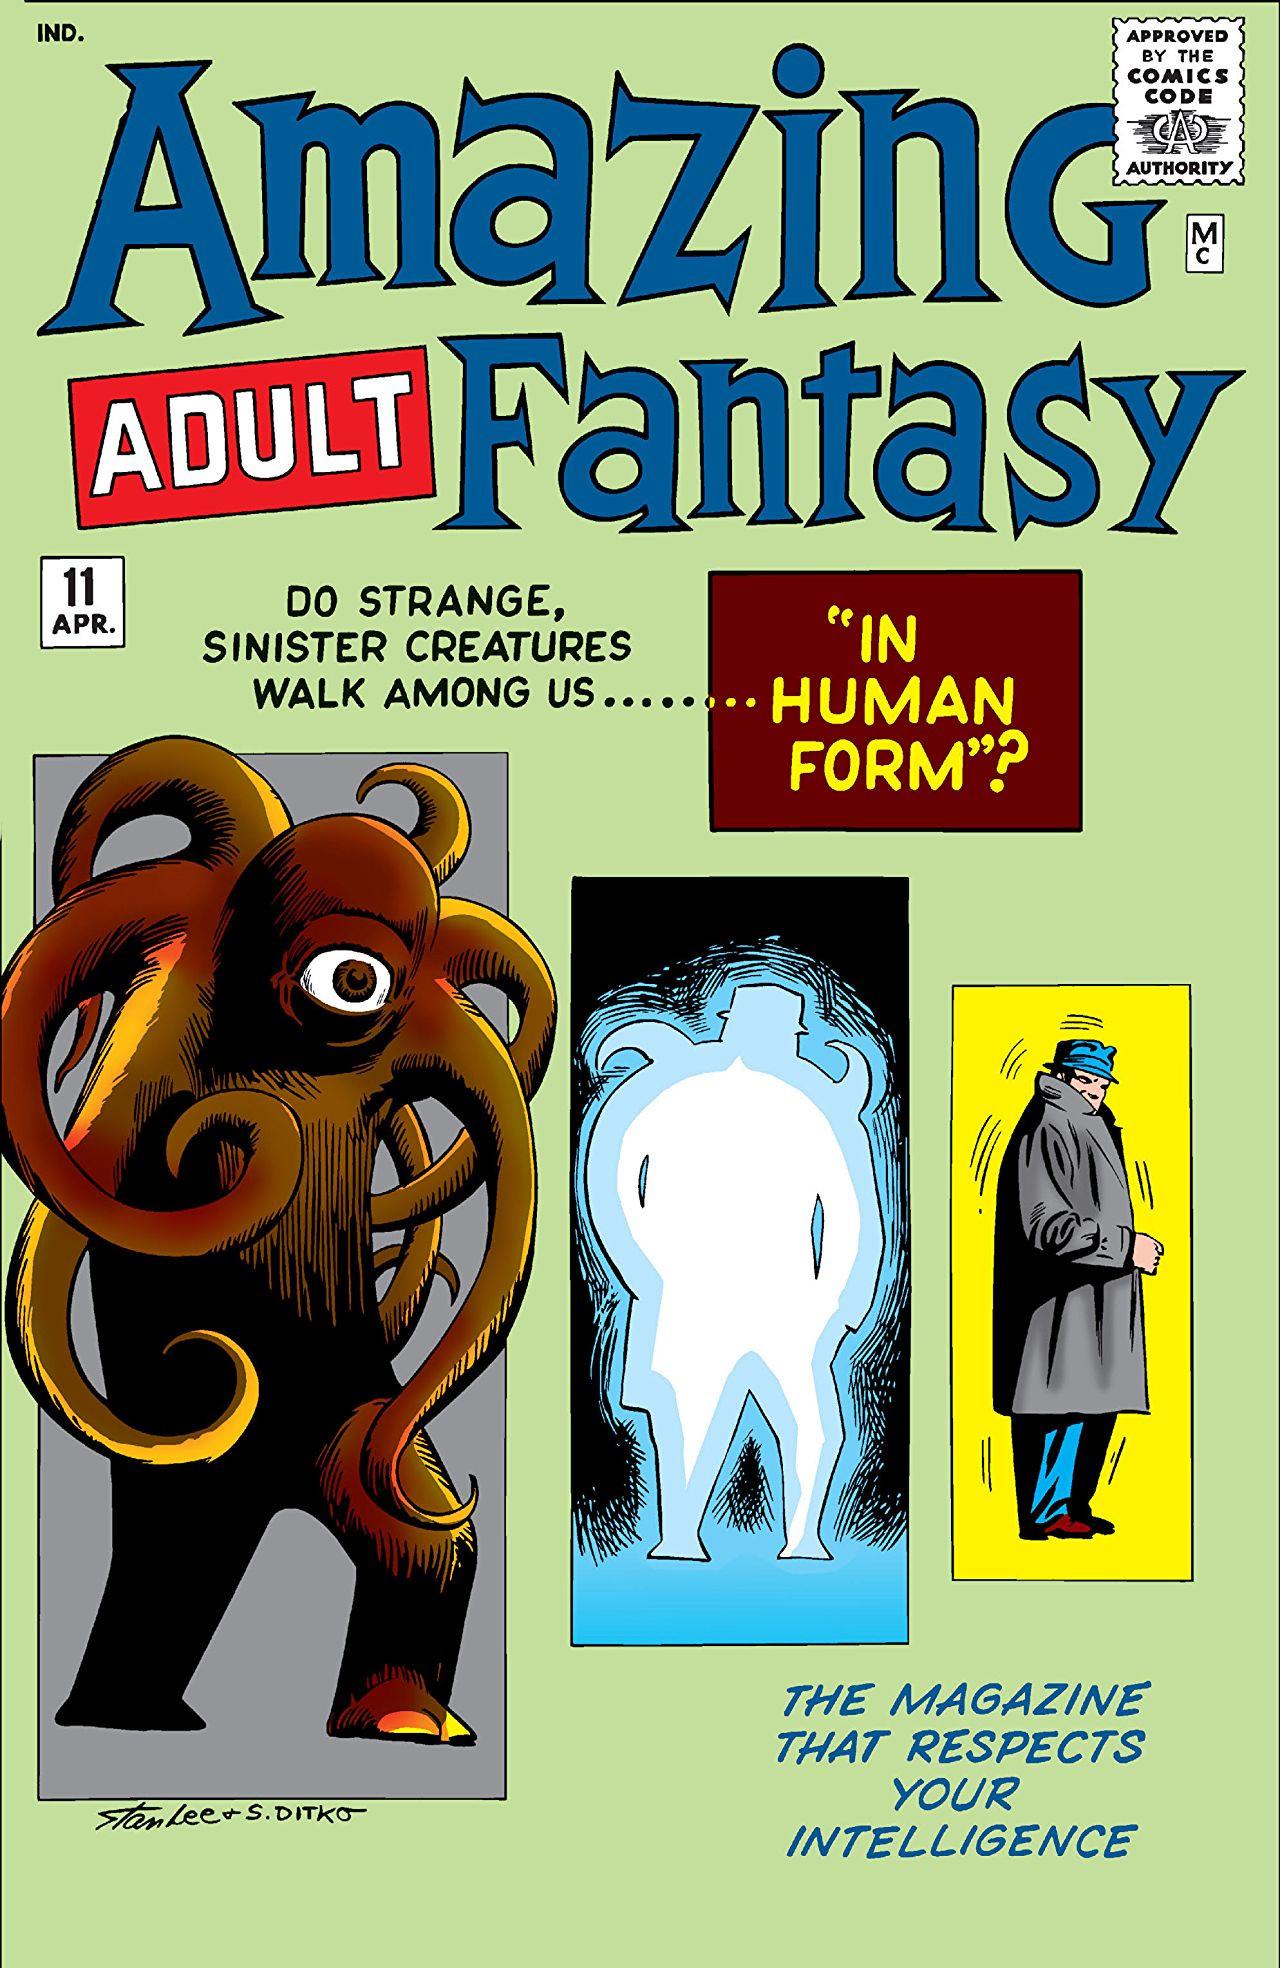 Amazing Adult Fantasy Vol 1 #11